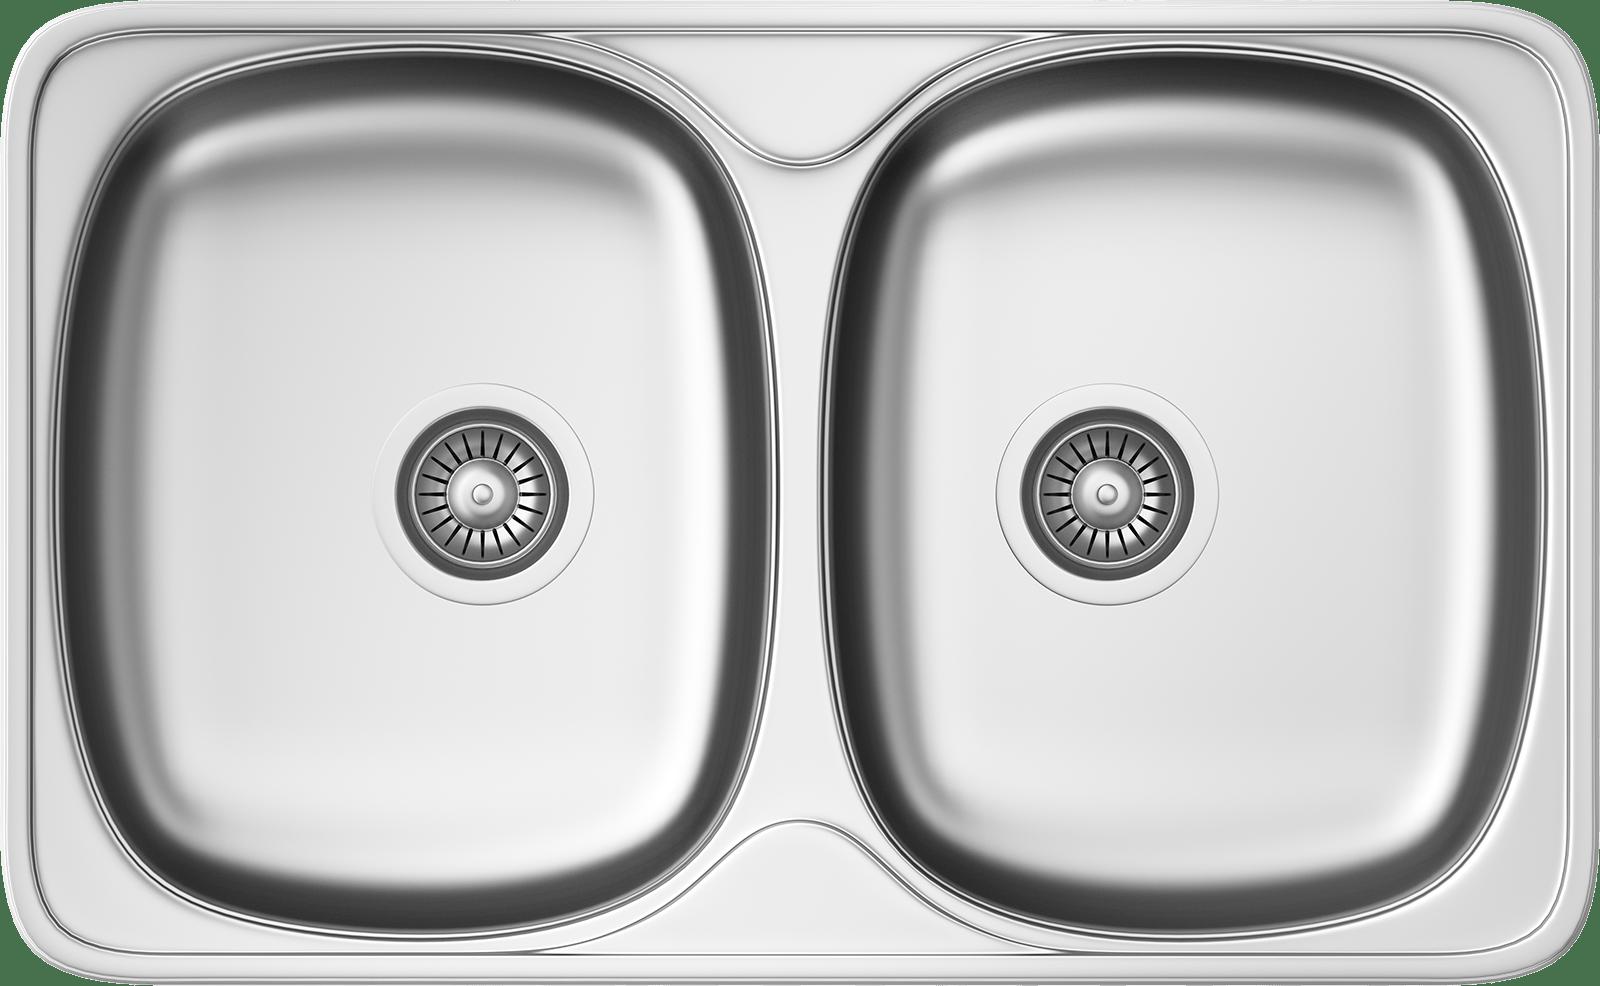 Küchenspüle KSS G 802 2B MICROLINEN